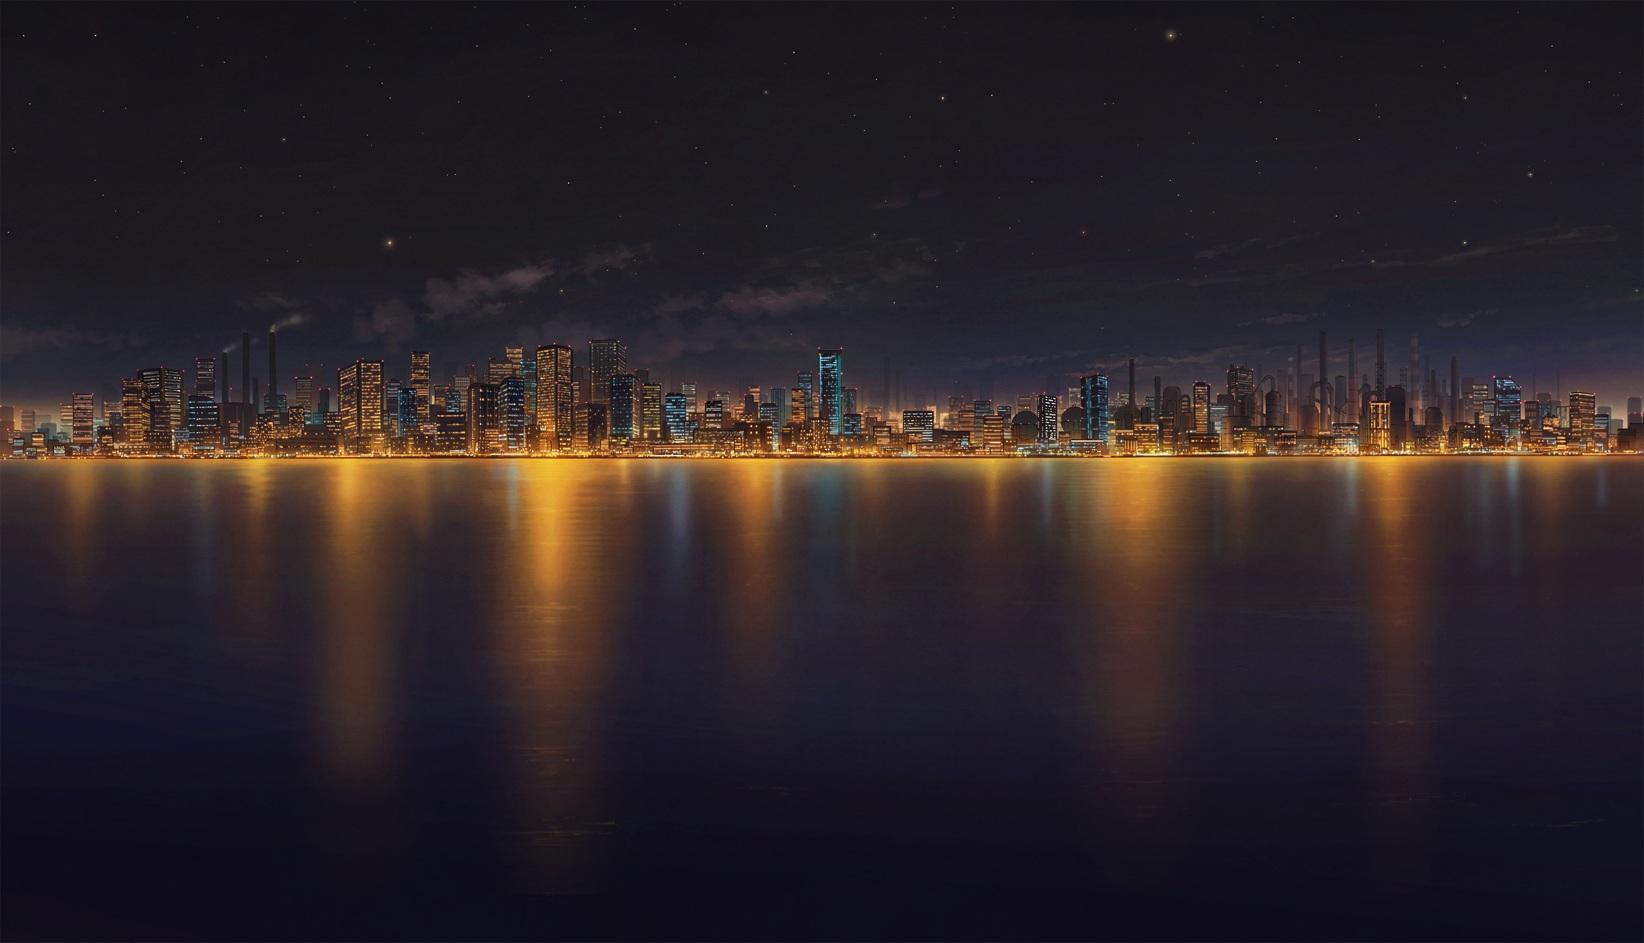 city night sky background - photo #12